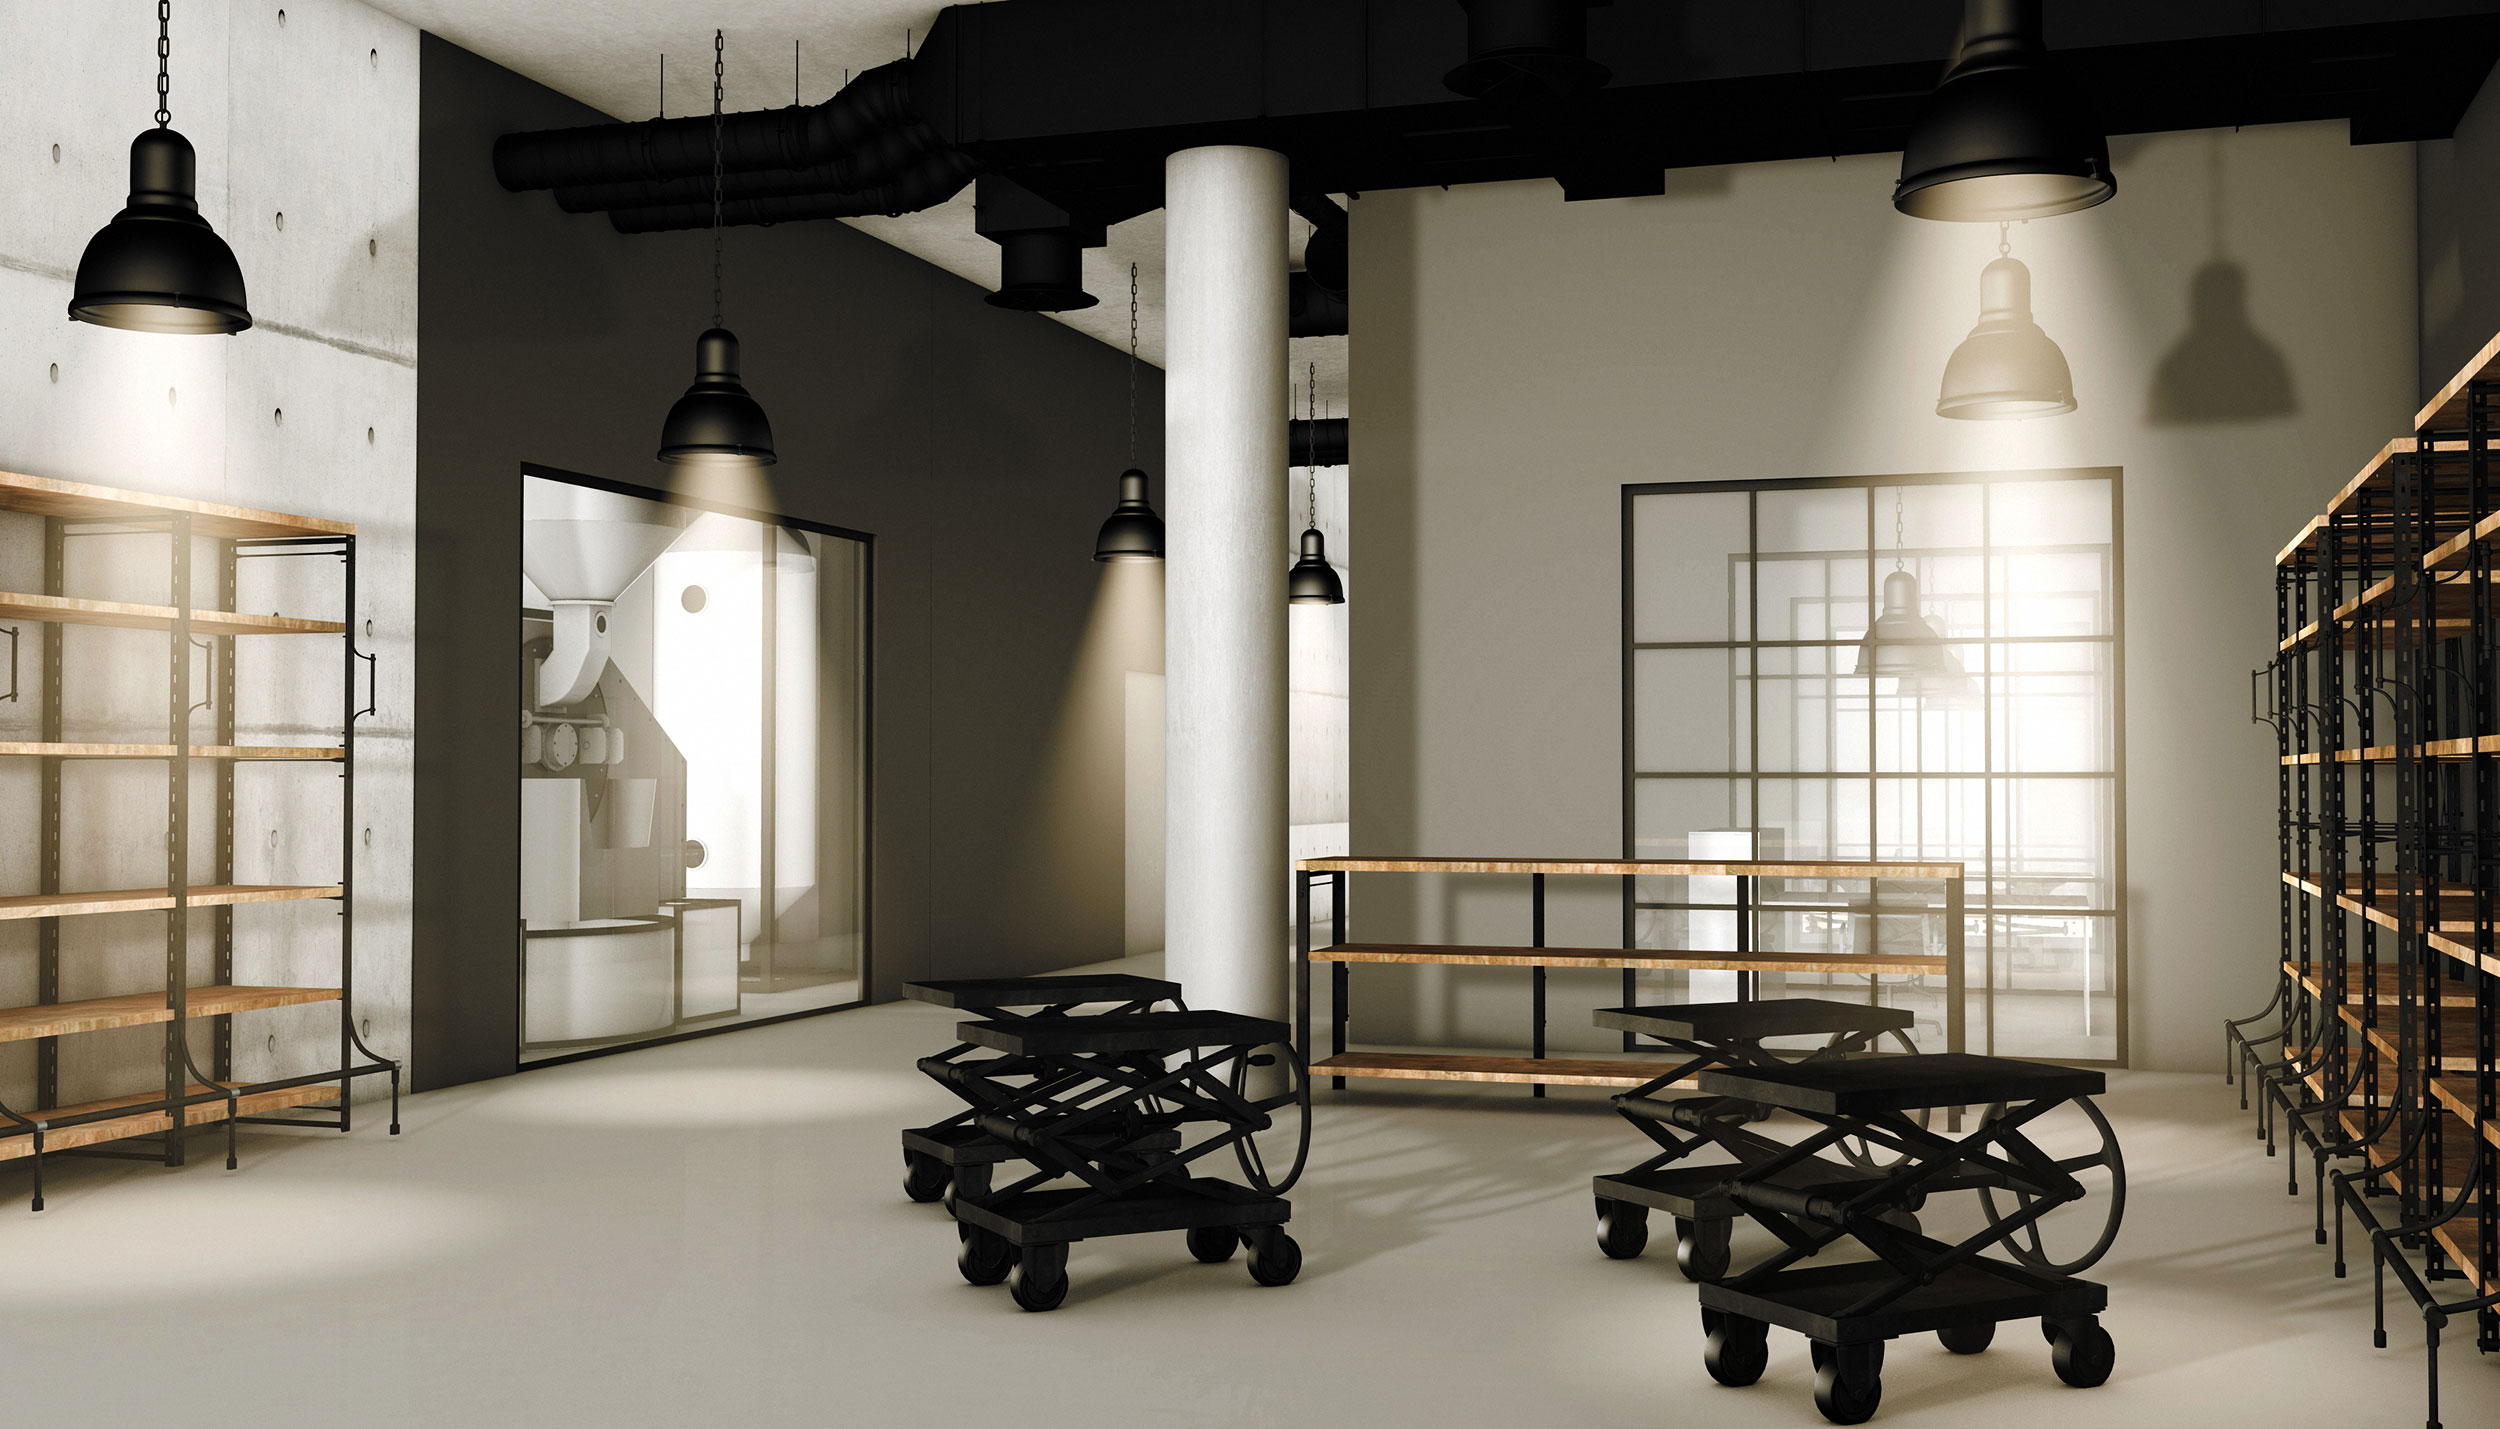 CAFFE POL Interieur Design